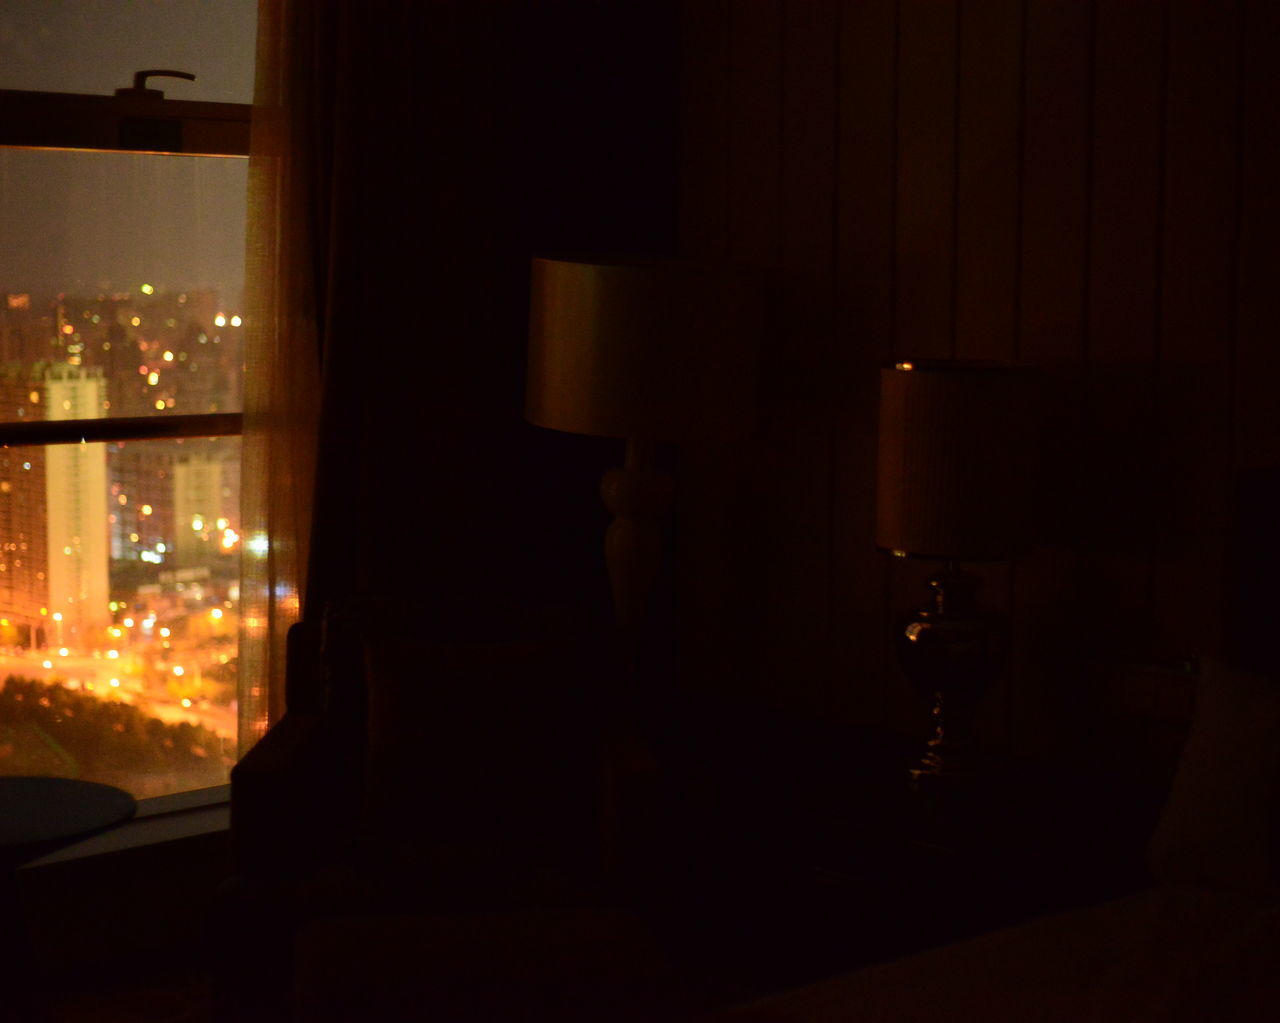 illuminated, night, indoors, no people, window, architecture, close-up